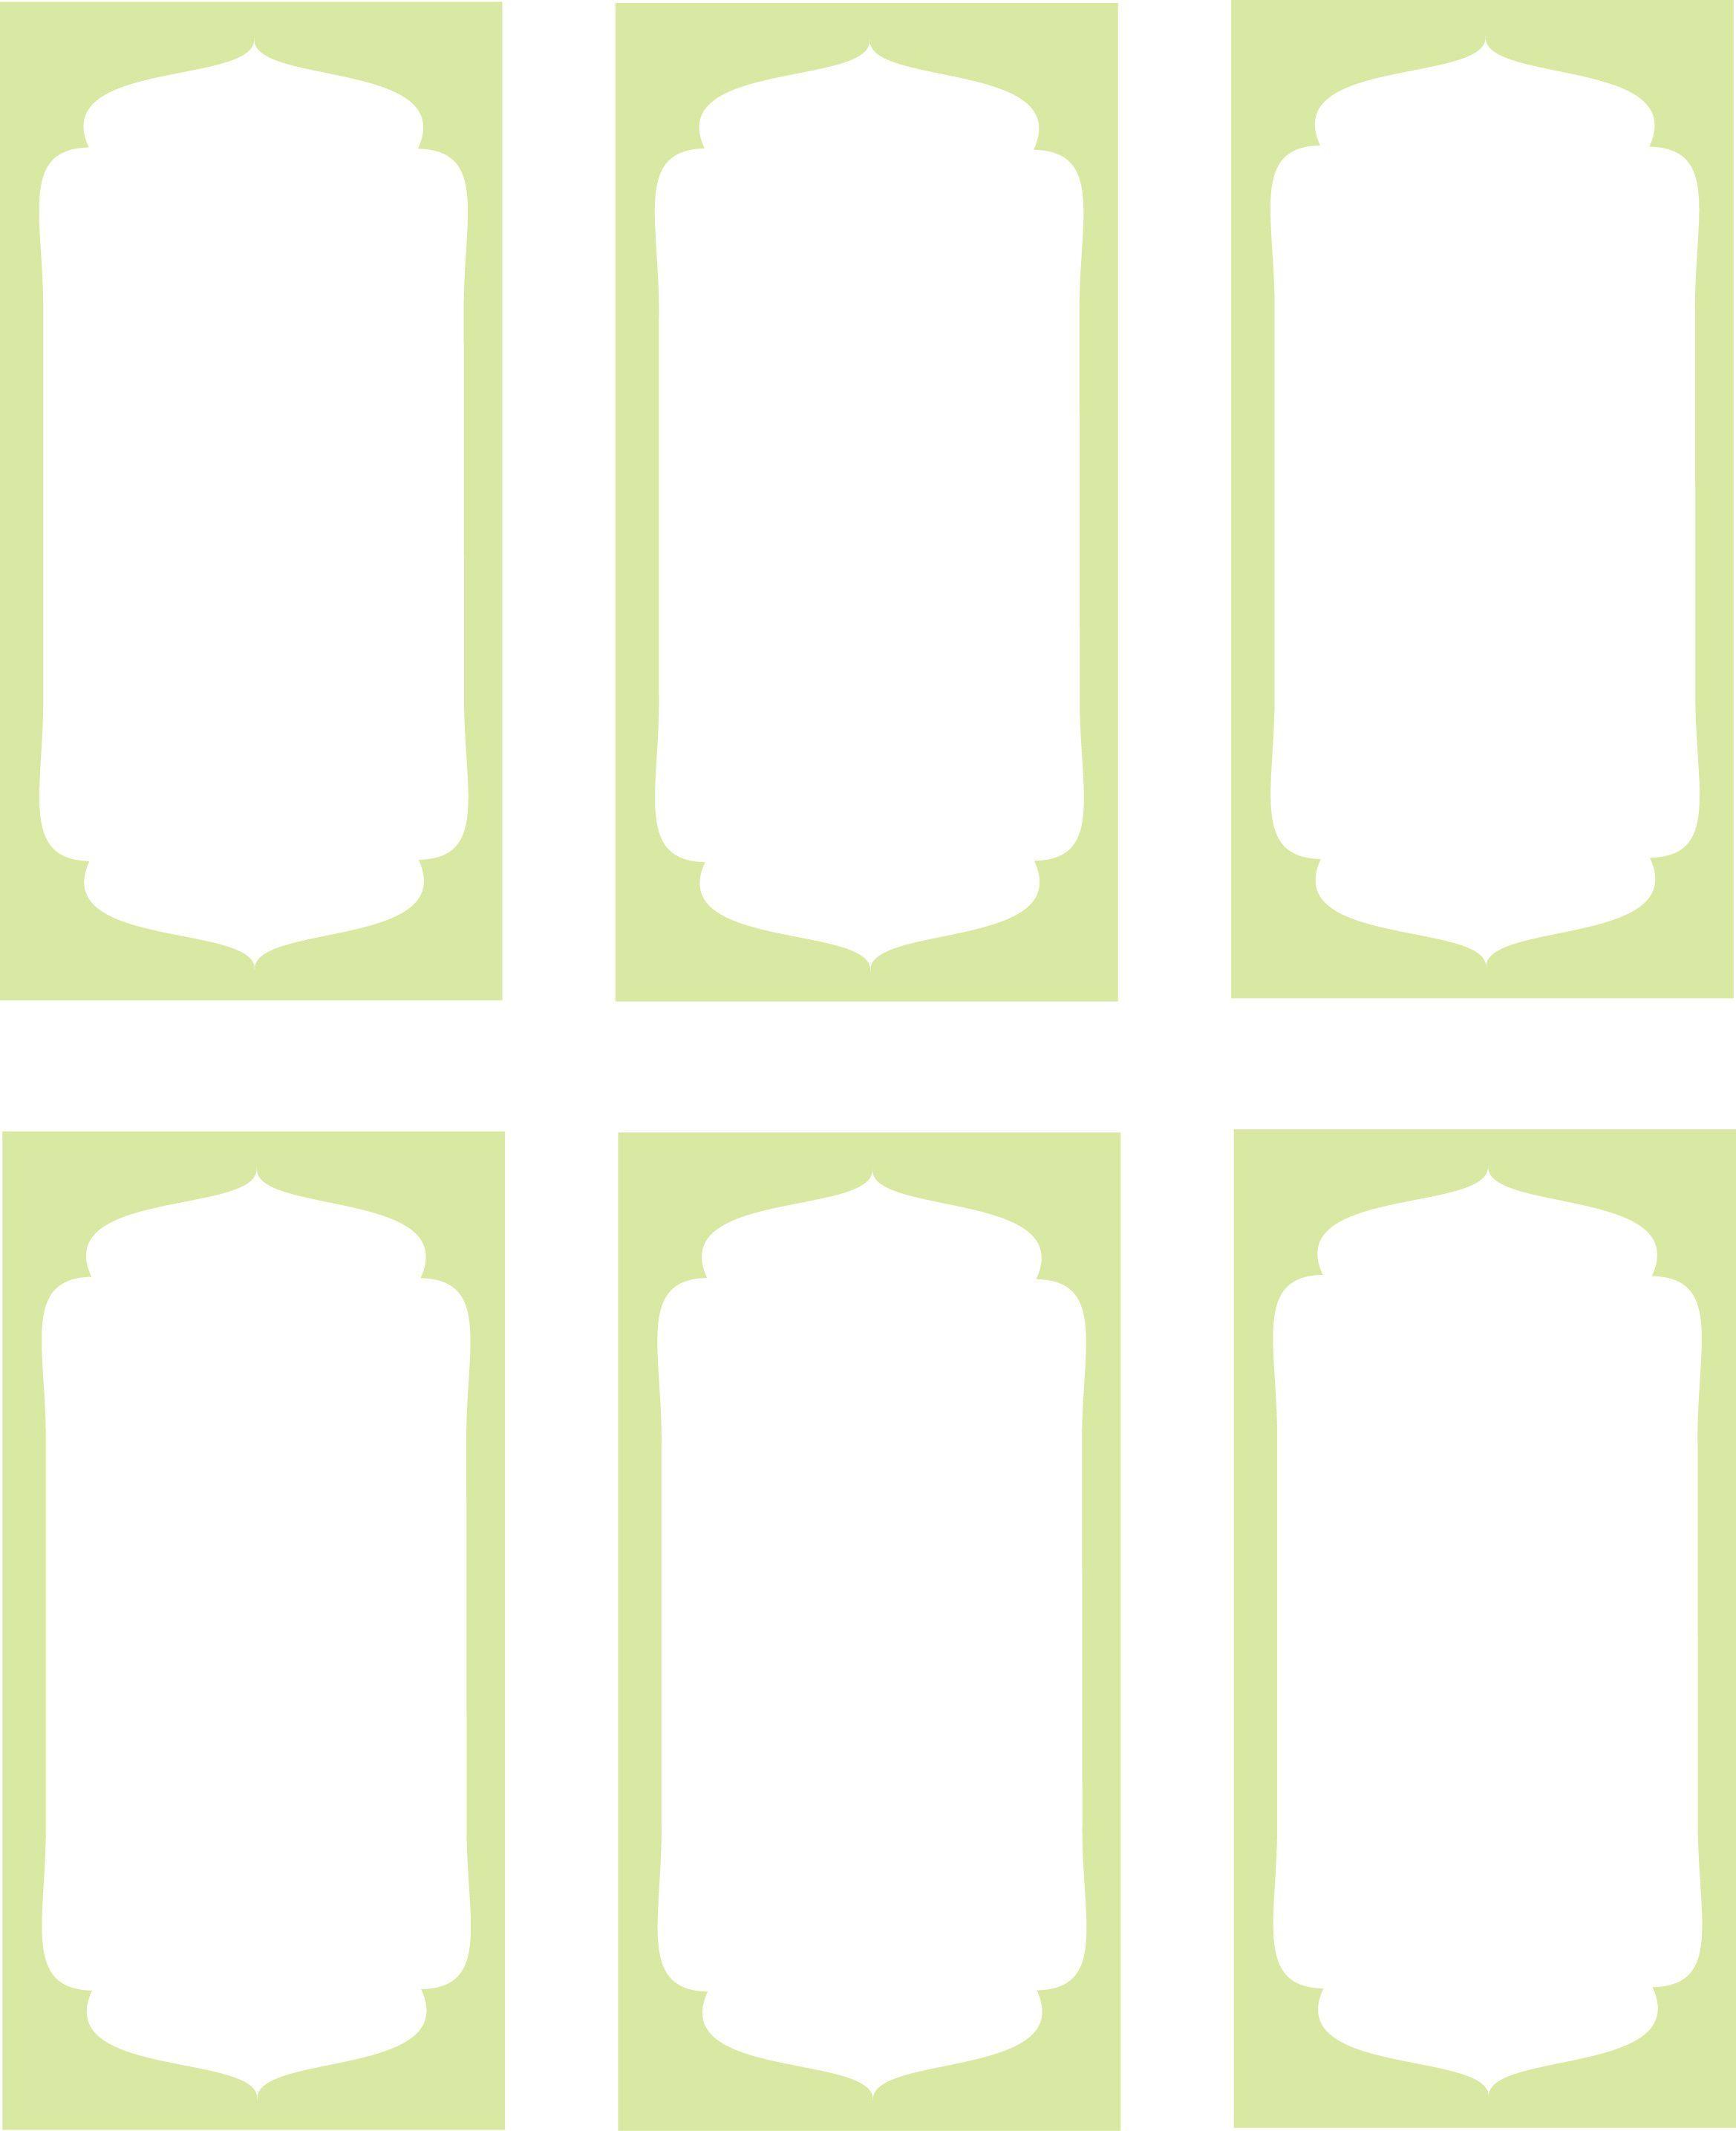 007 Stunning Free Printable Return Addres Label Template High Def  Templates ChristmaFull